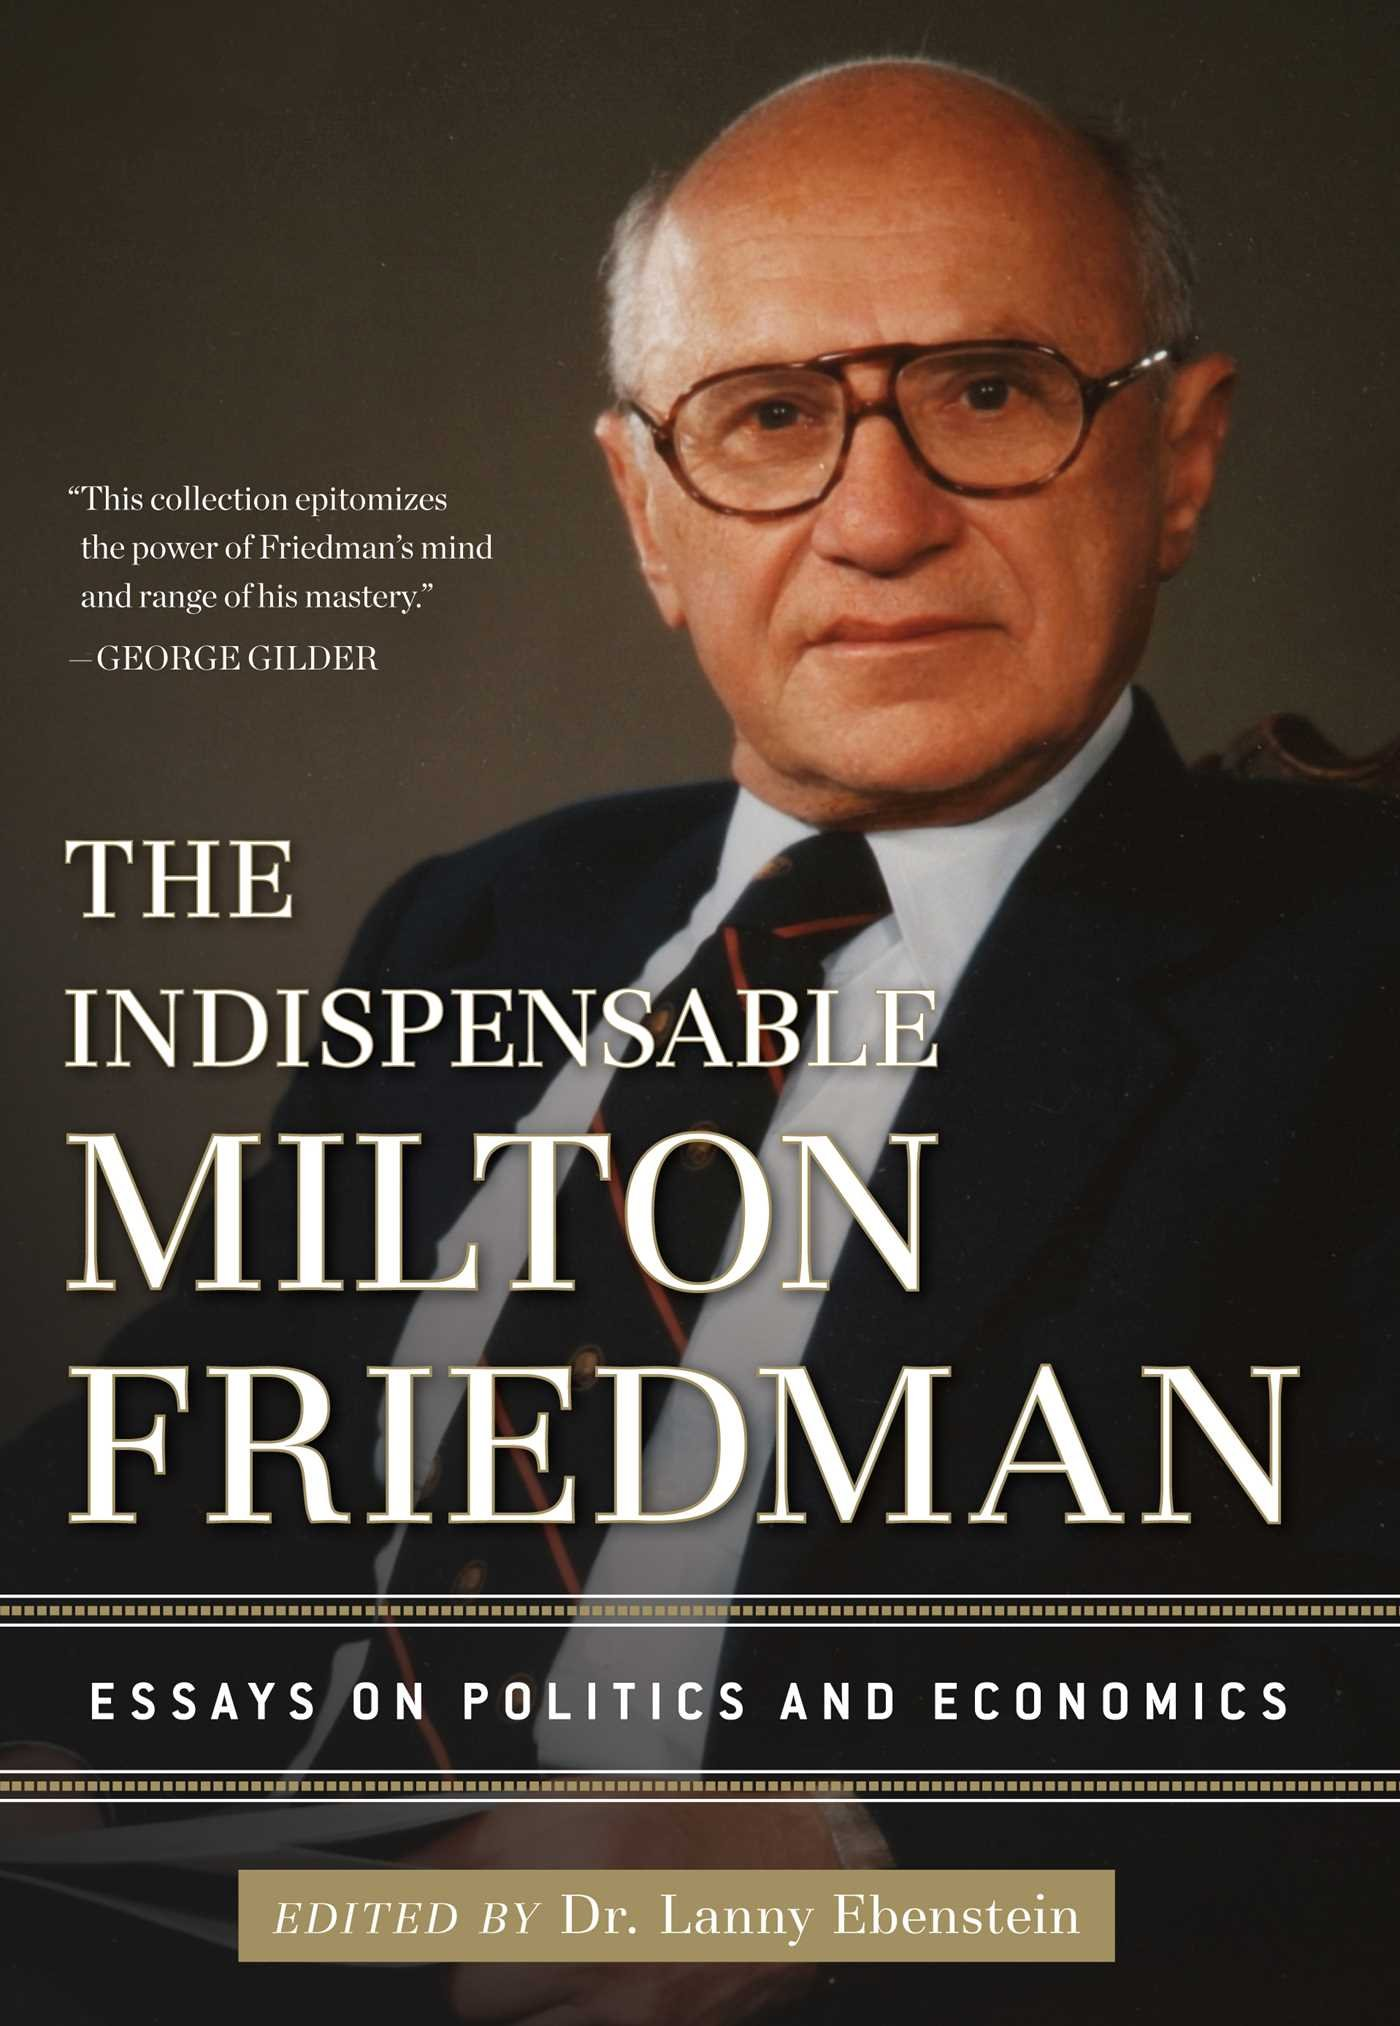 The Indispensable Milton Friedman: Essays on Politics and Economics